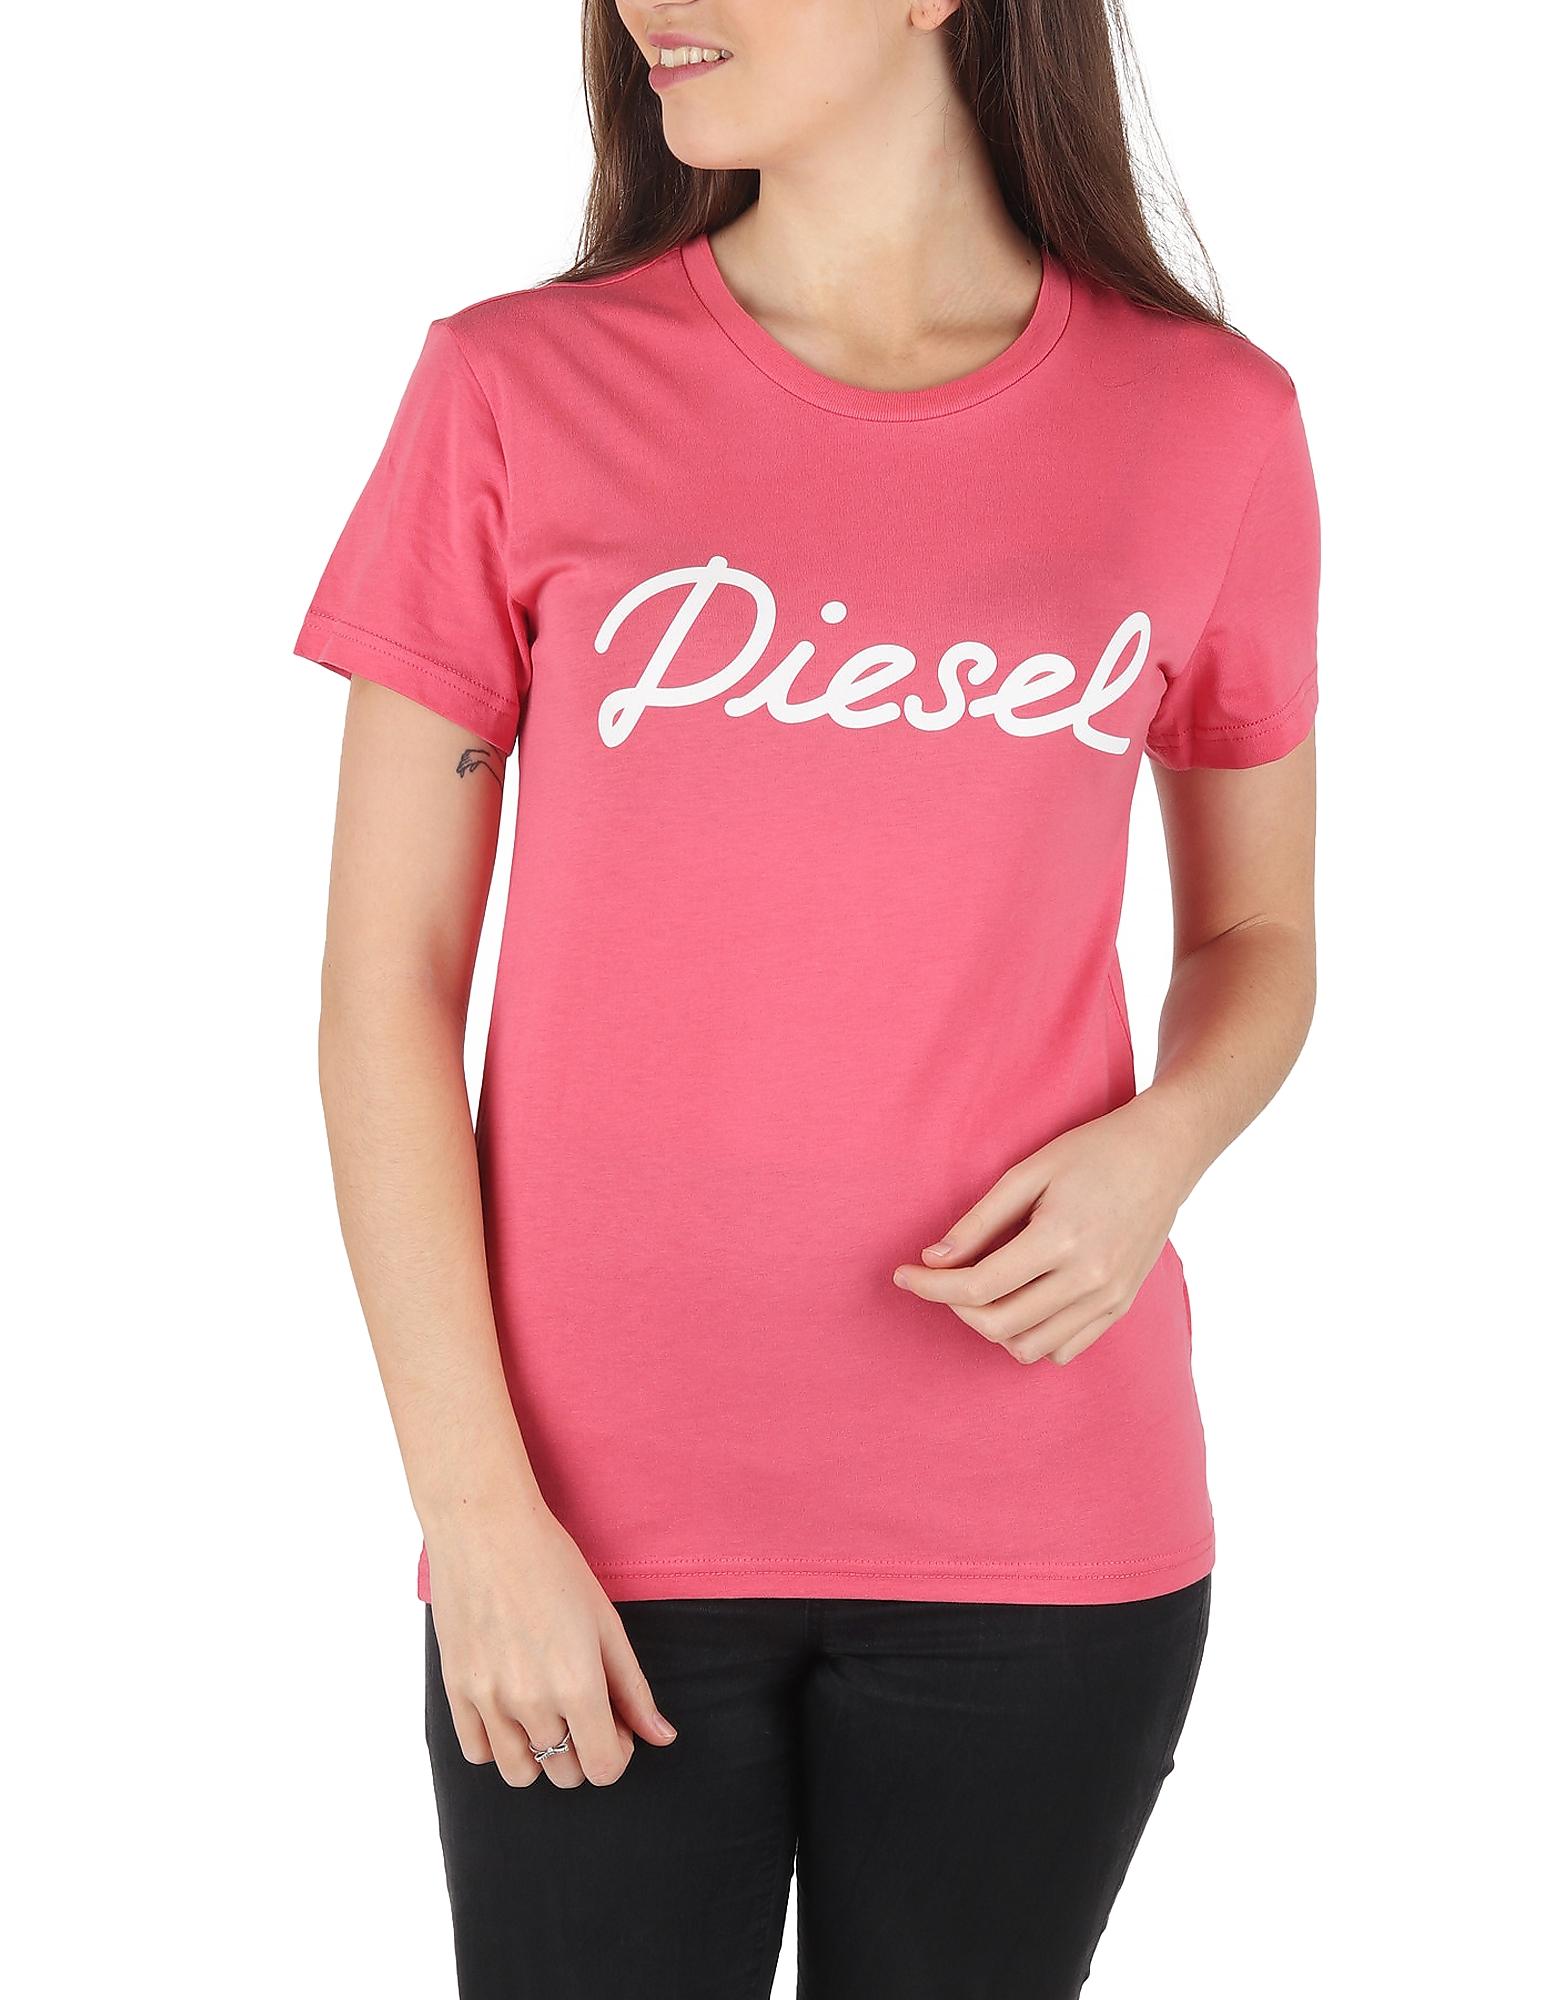 Diesel Designer T-Shirts & Tops, T Sully Ah B Pink Printed Cotton T-Shirt